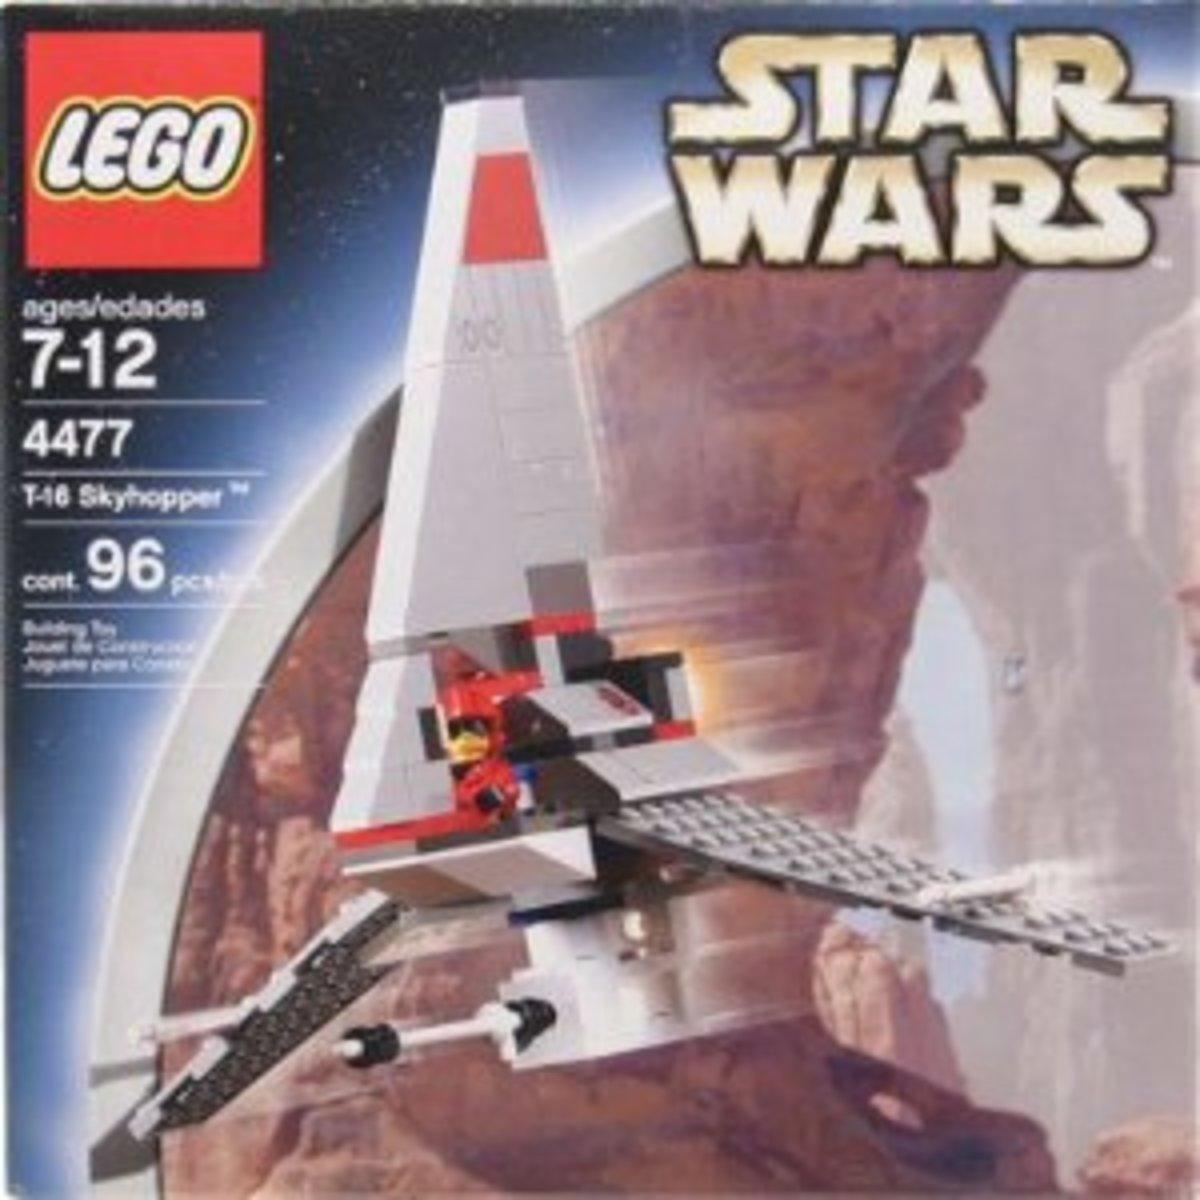 LEGO Star Wars T-16 Skyhopper 4477 Box